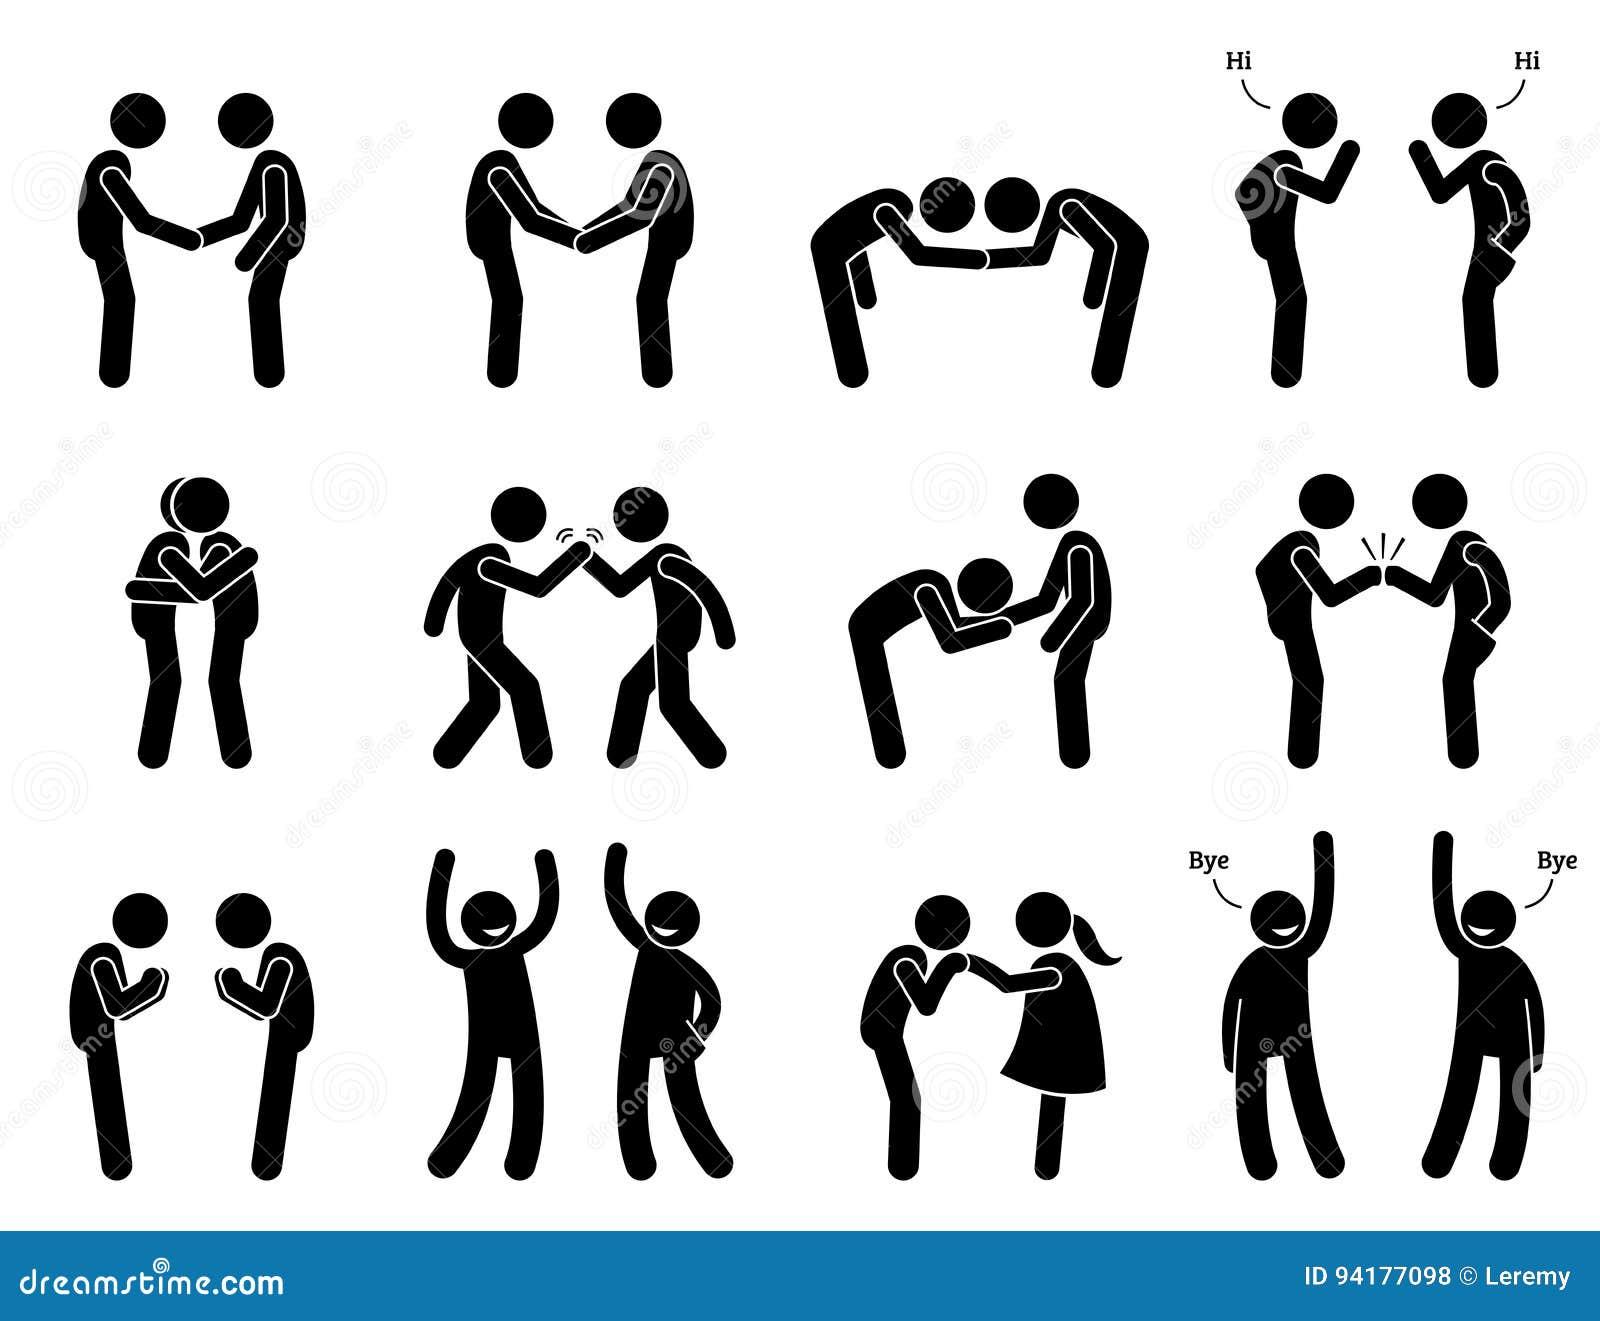 People Meeting And Greeting Gestures Etiquette Stock Vector